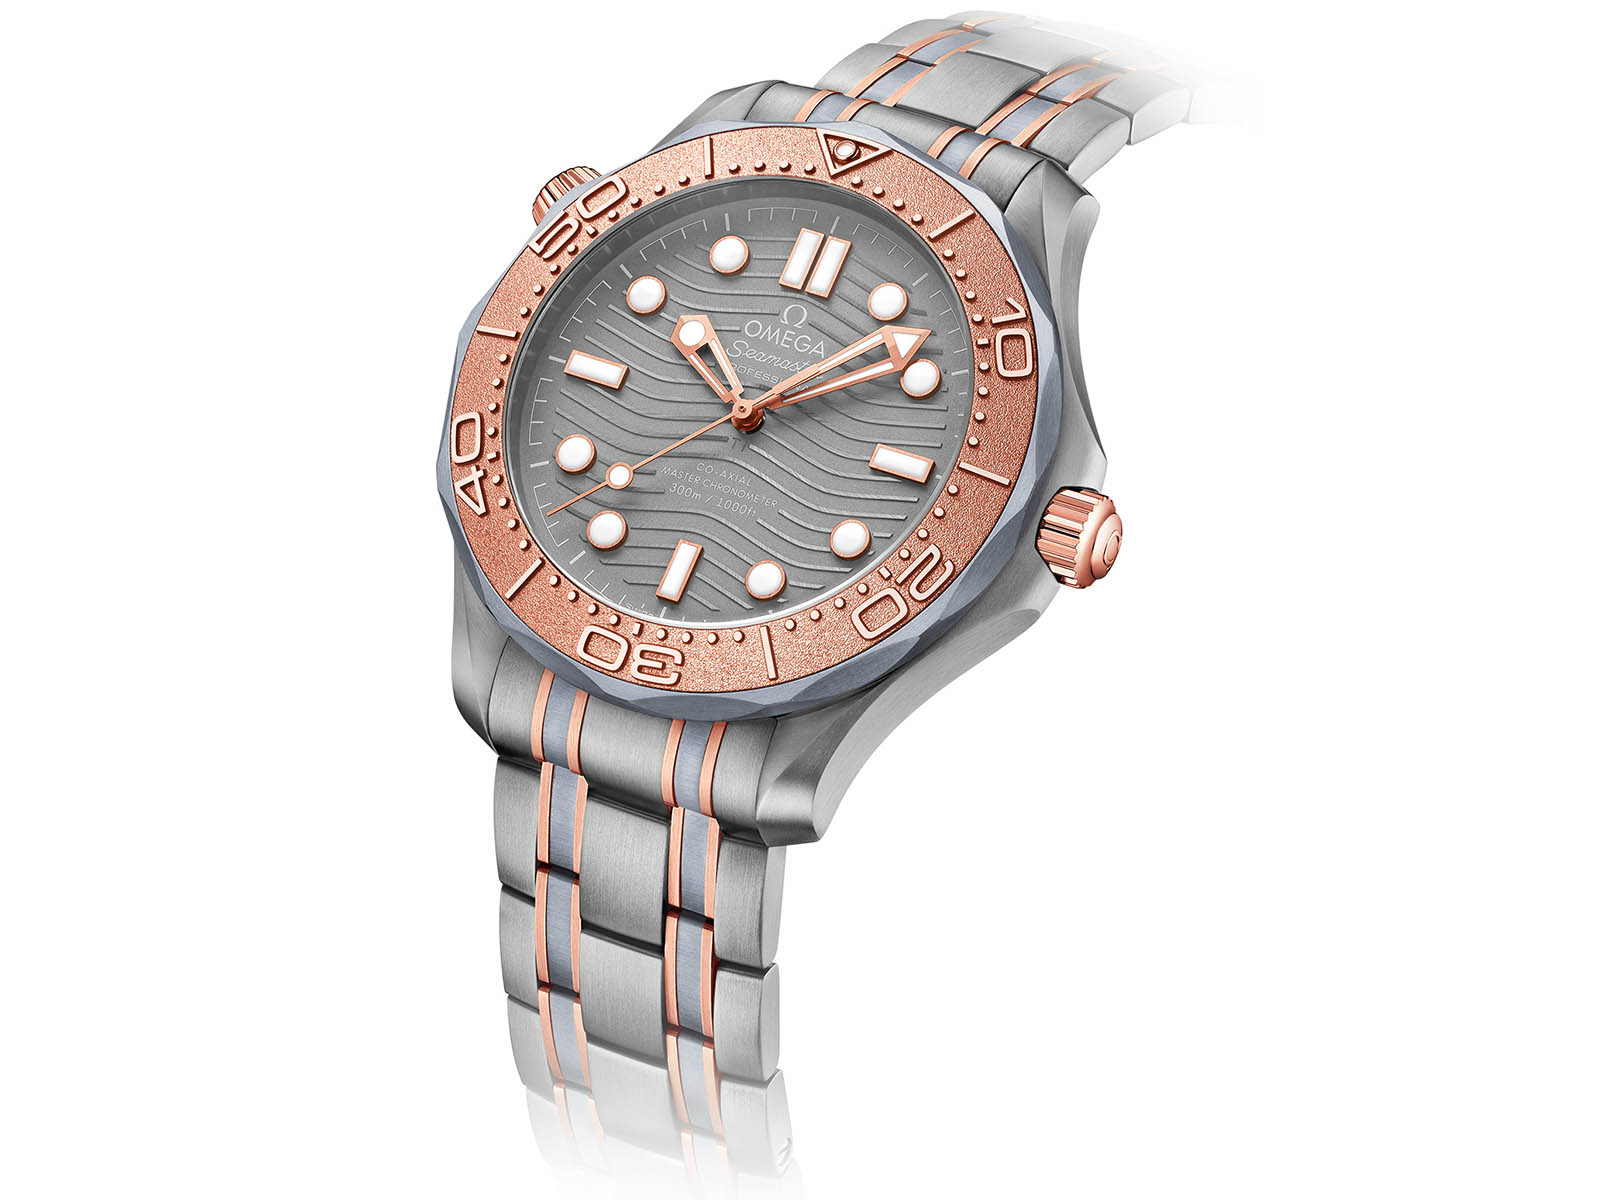 210-60-42-20-99-001-omega-seamaster-diver-300m-tantalum-2.jpg